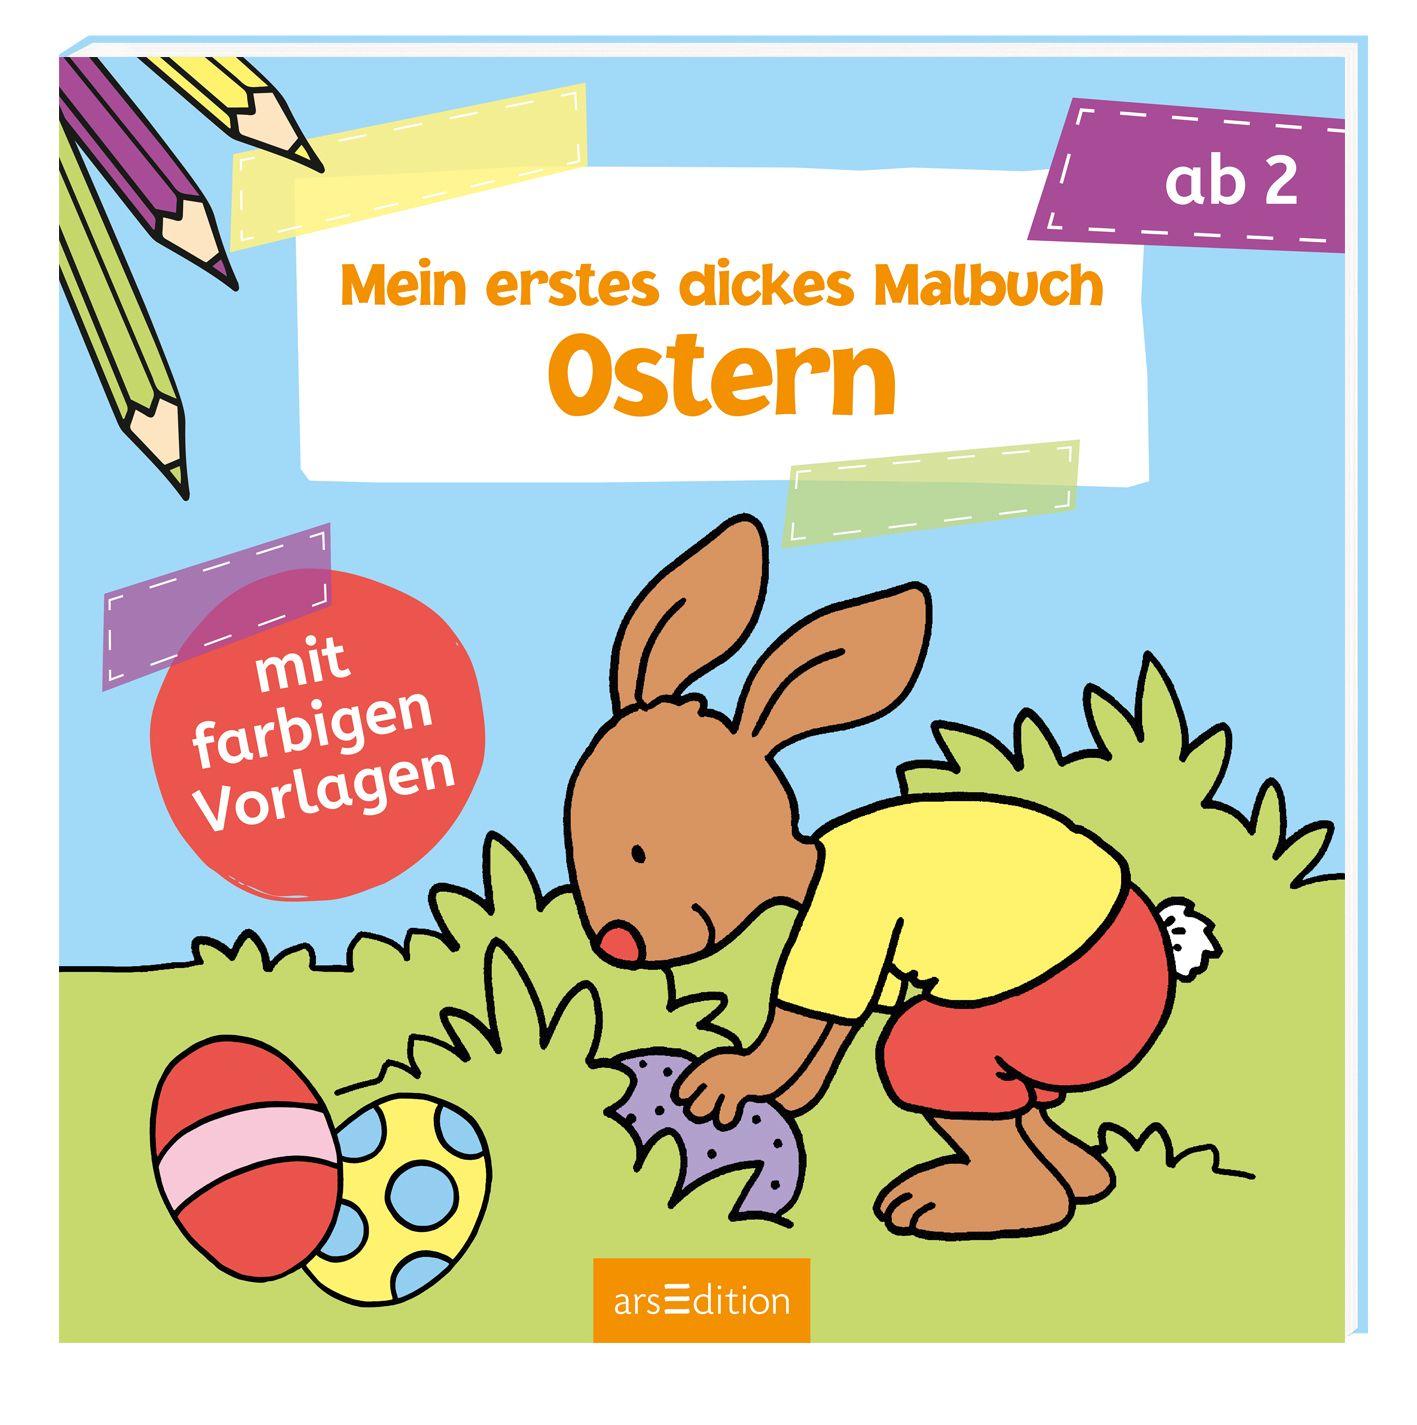 NEU Mein erstes dickes Malbuch Ostern Corina Beurenmeister 821733